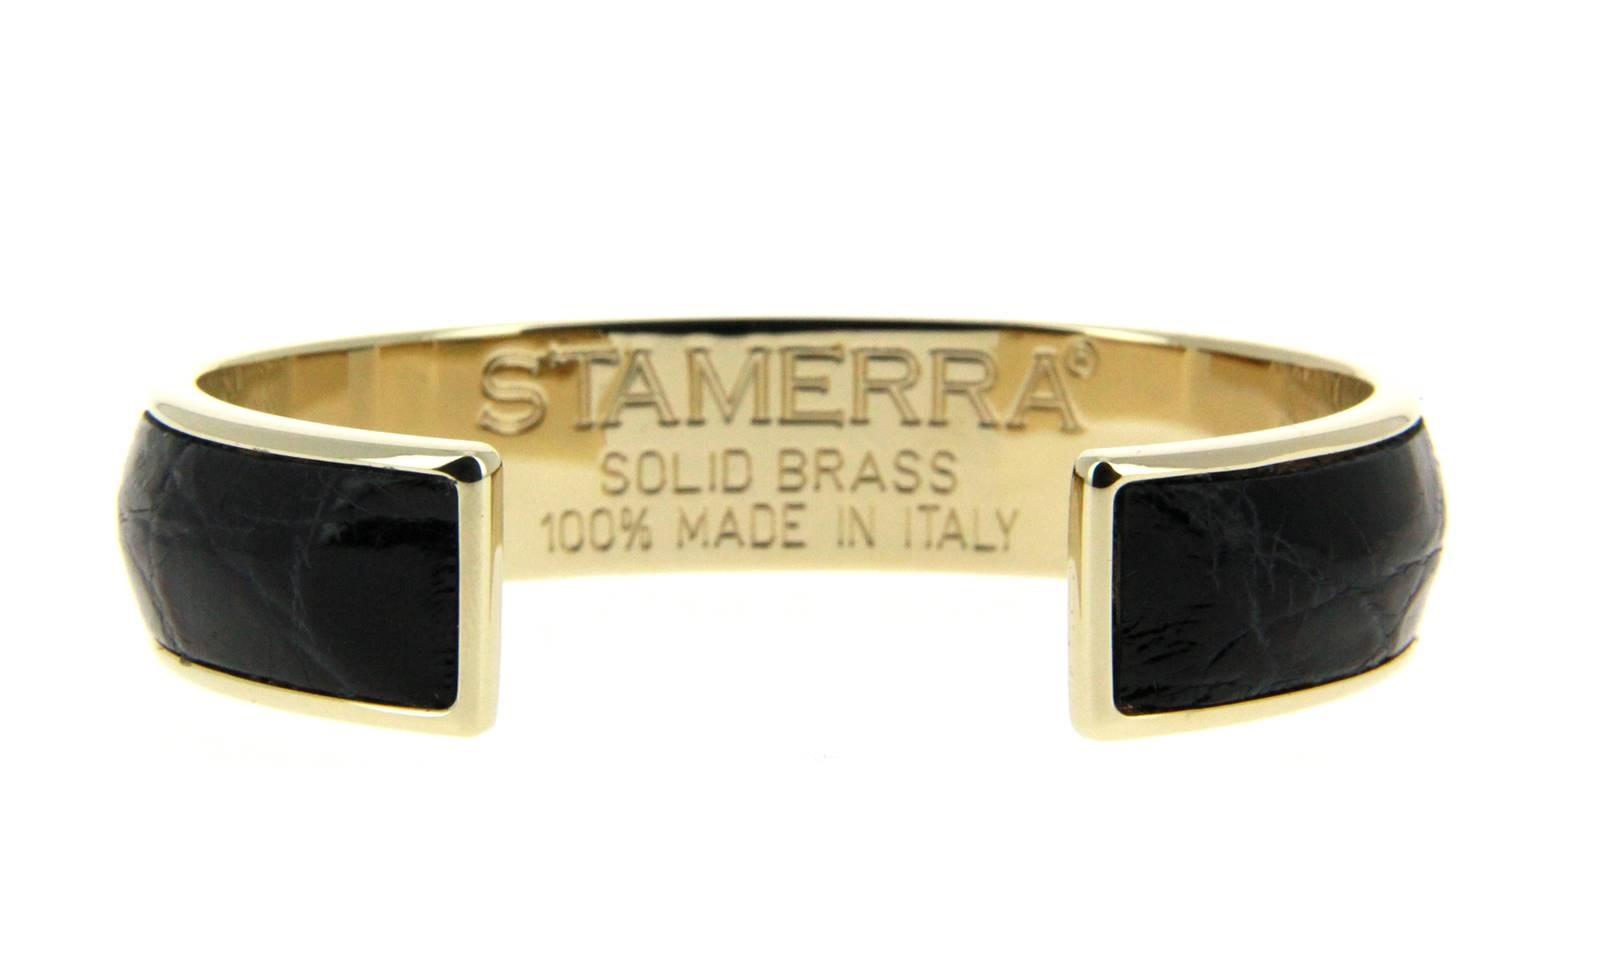 Stamerra Armband VERO GENUINE CROCO MEDON GOLD NERO